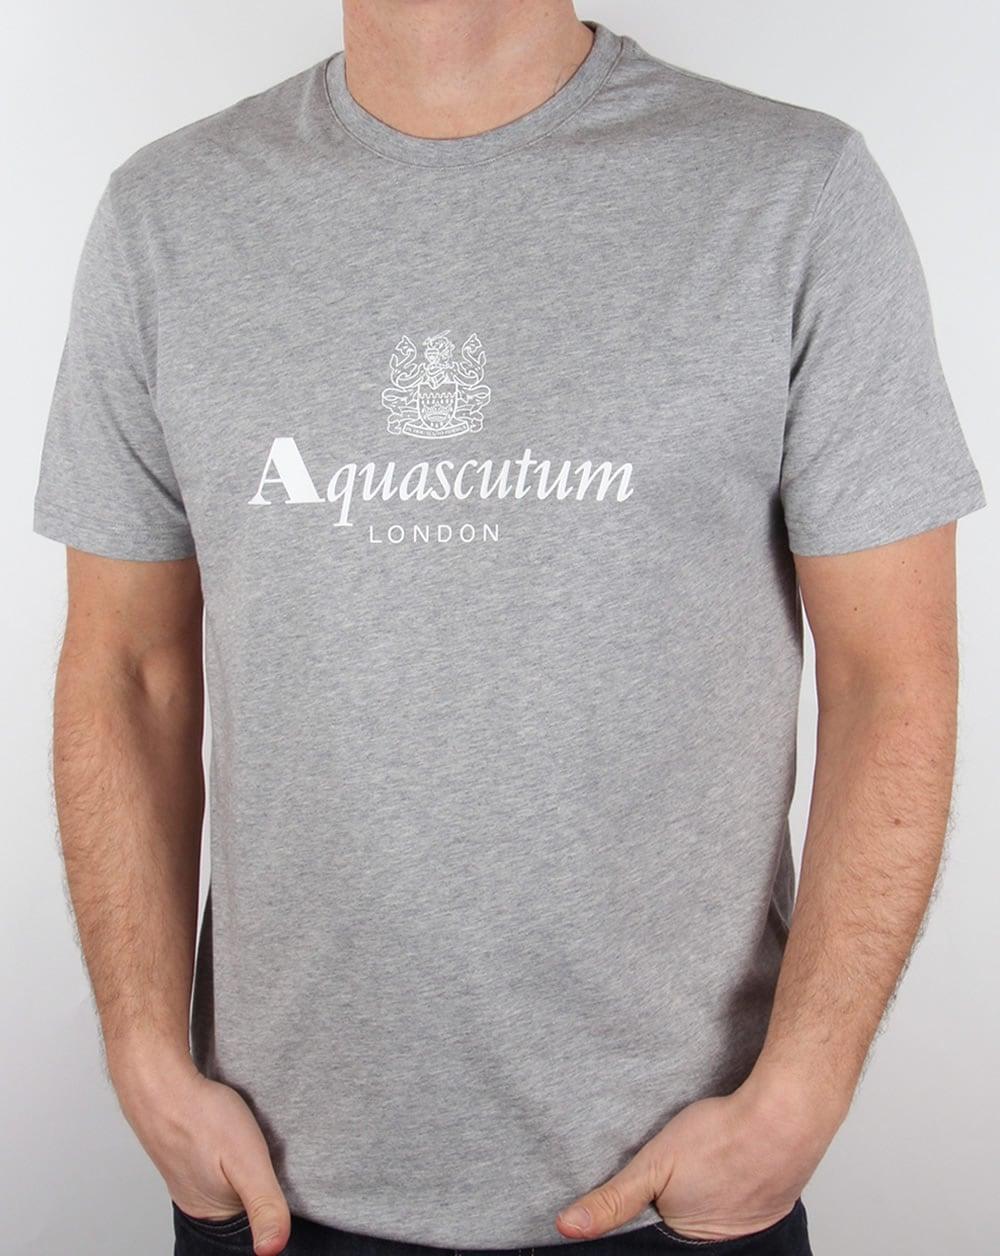 Aquascutum griffin t shirt grey marl tee graphic crew neck for Grey marl t shirt